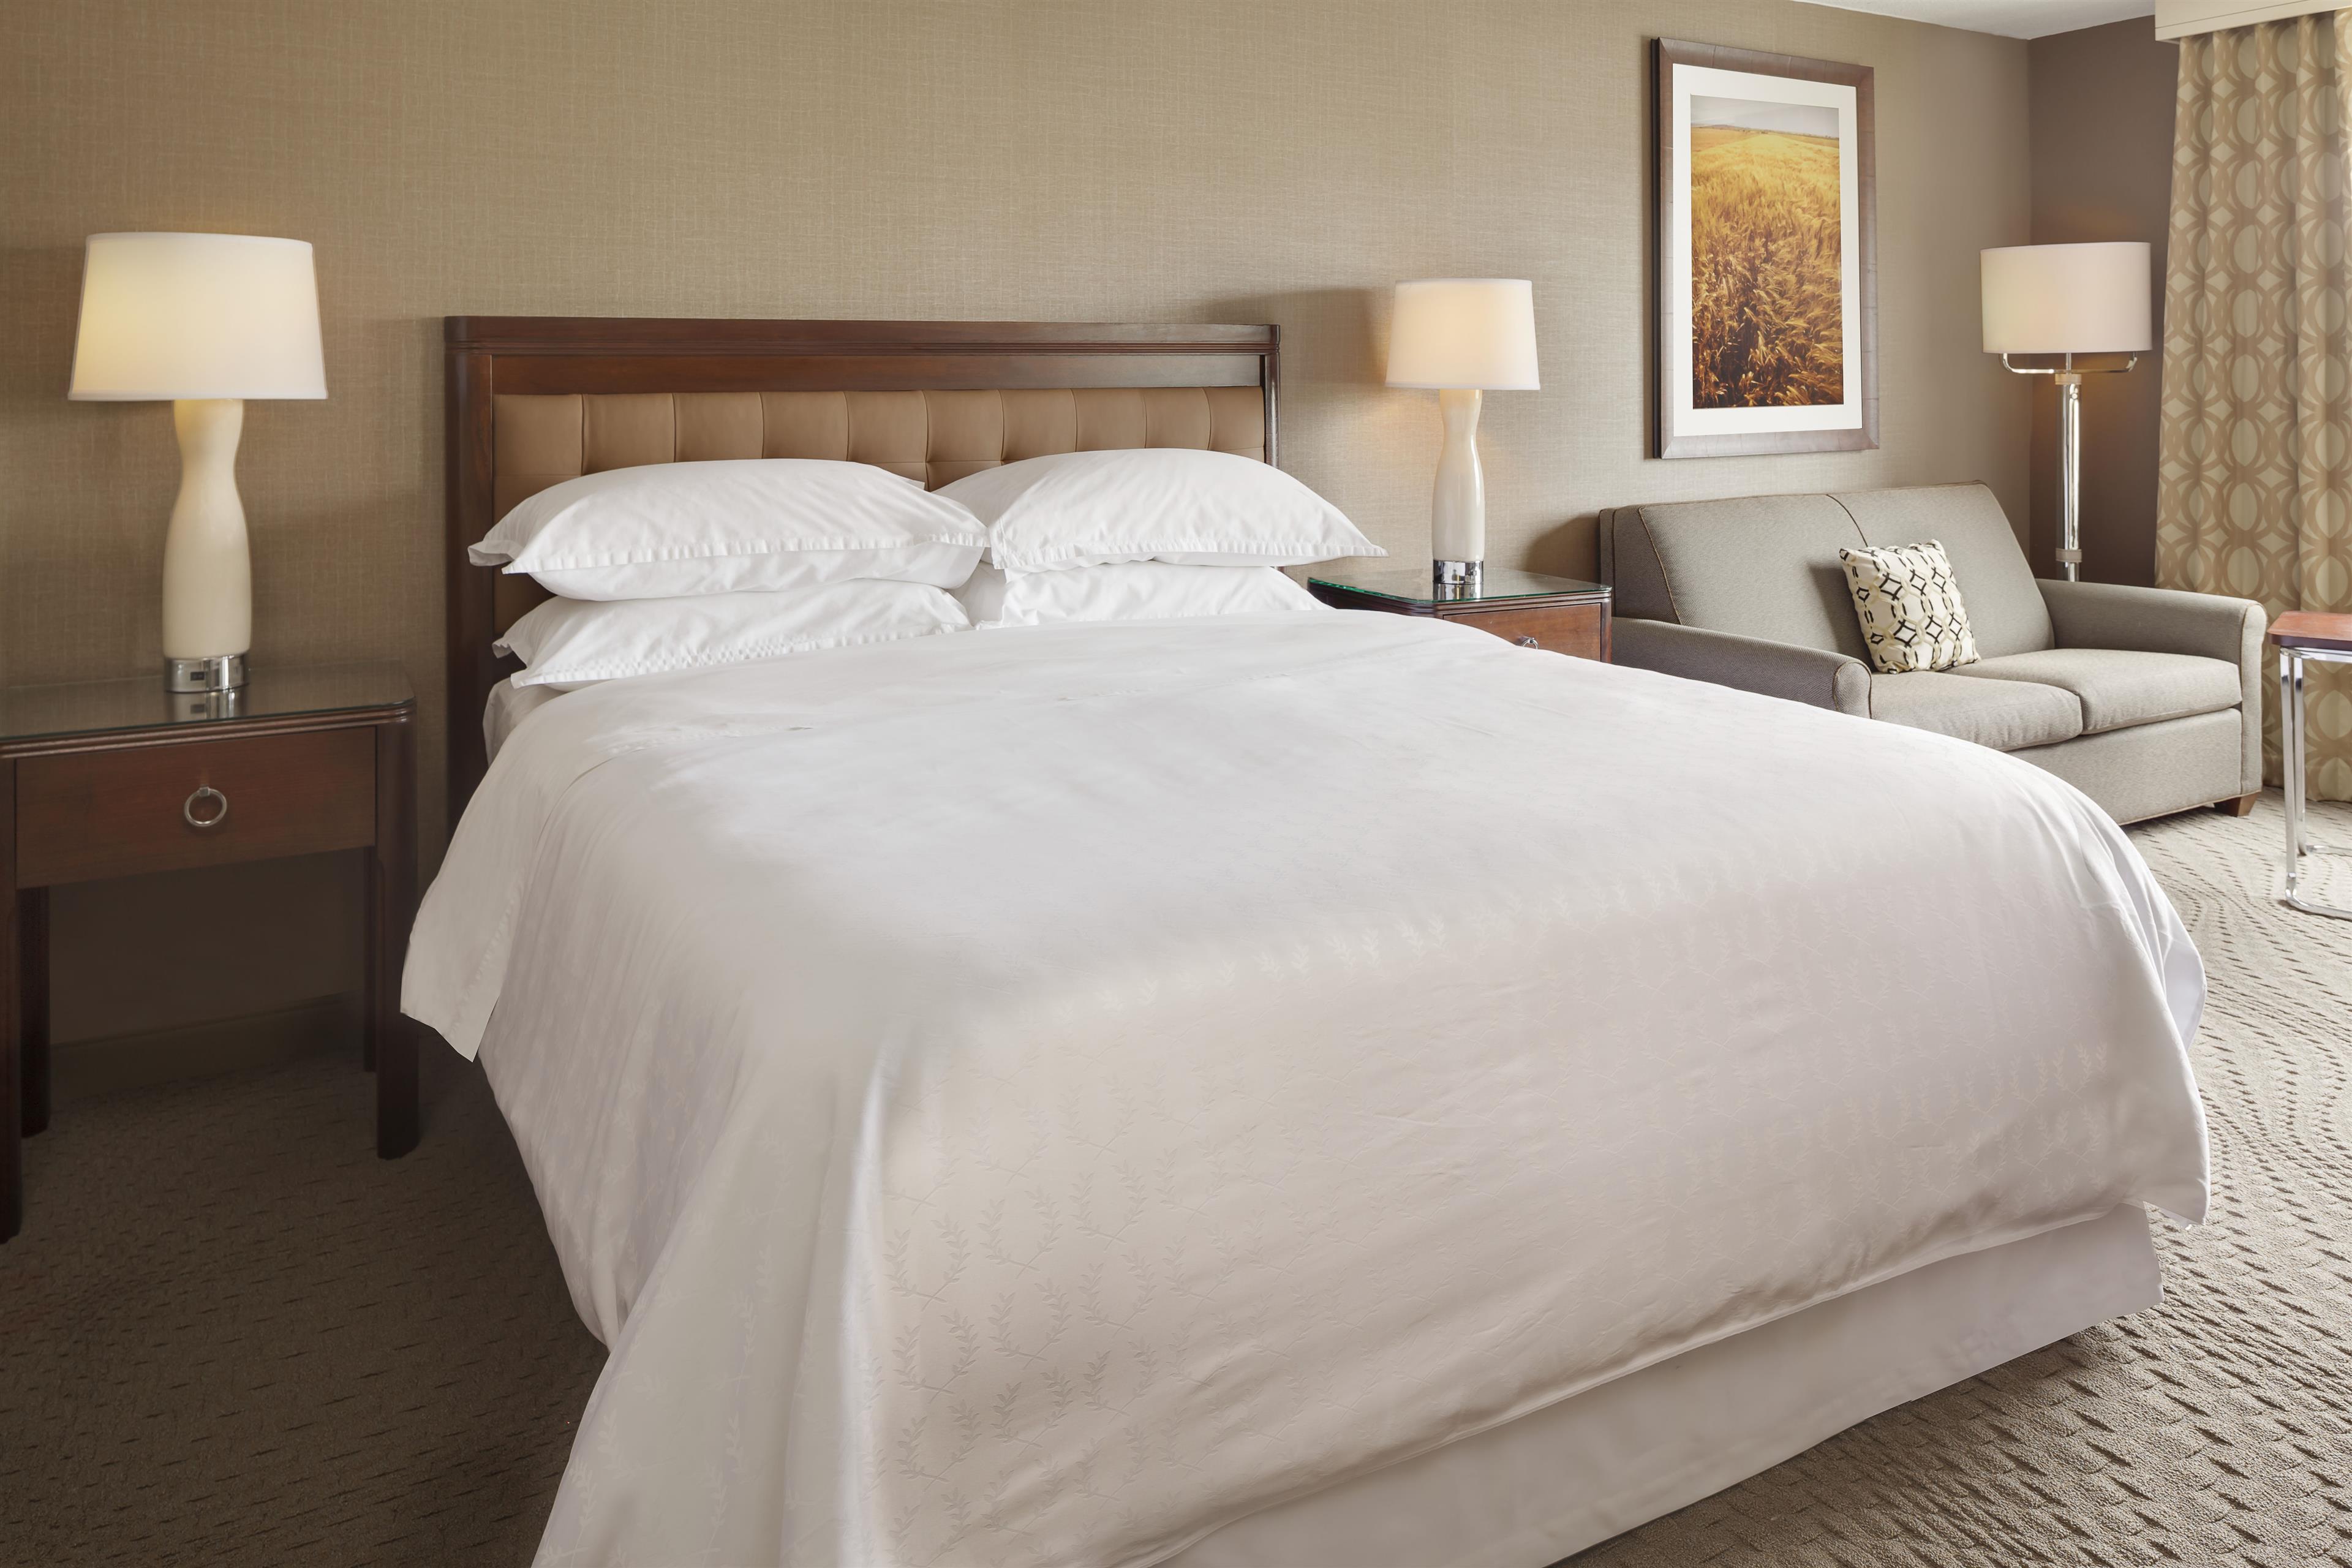 Sheraton Omaha Hotel image 1